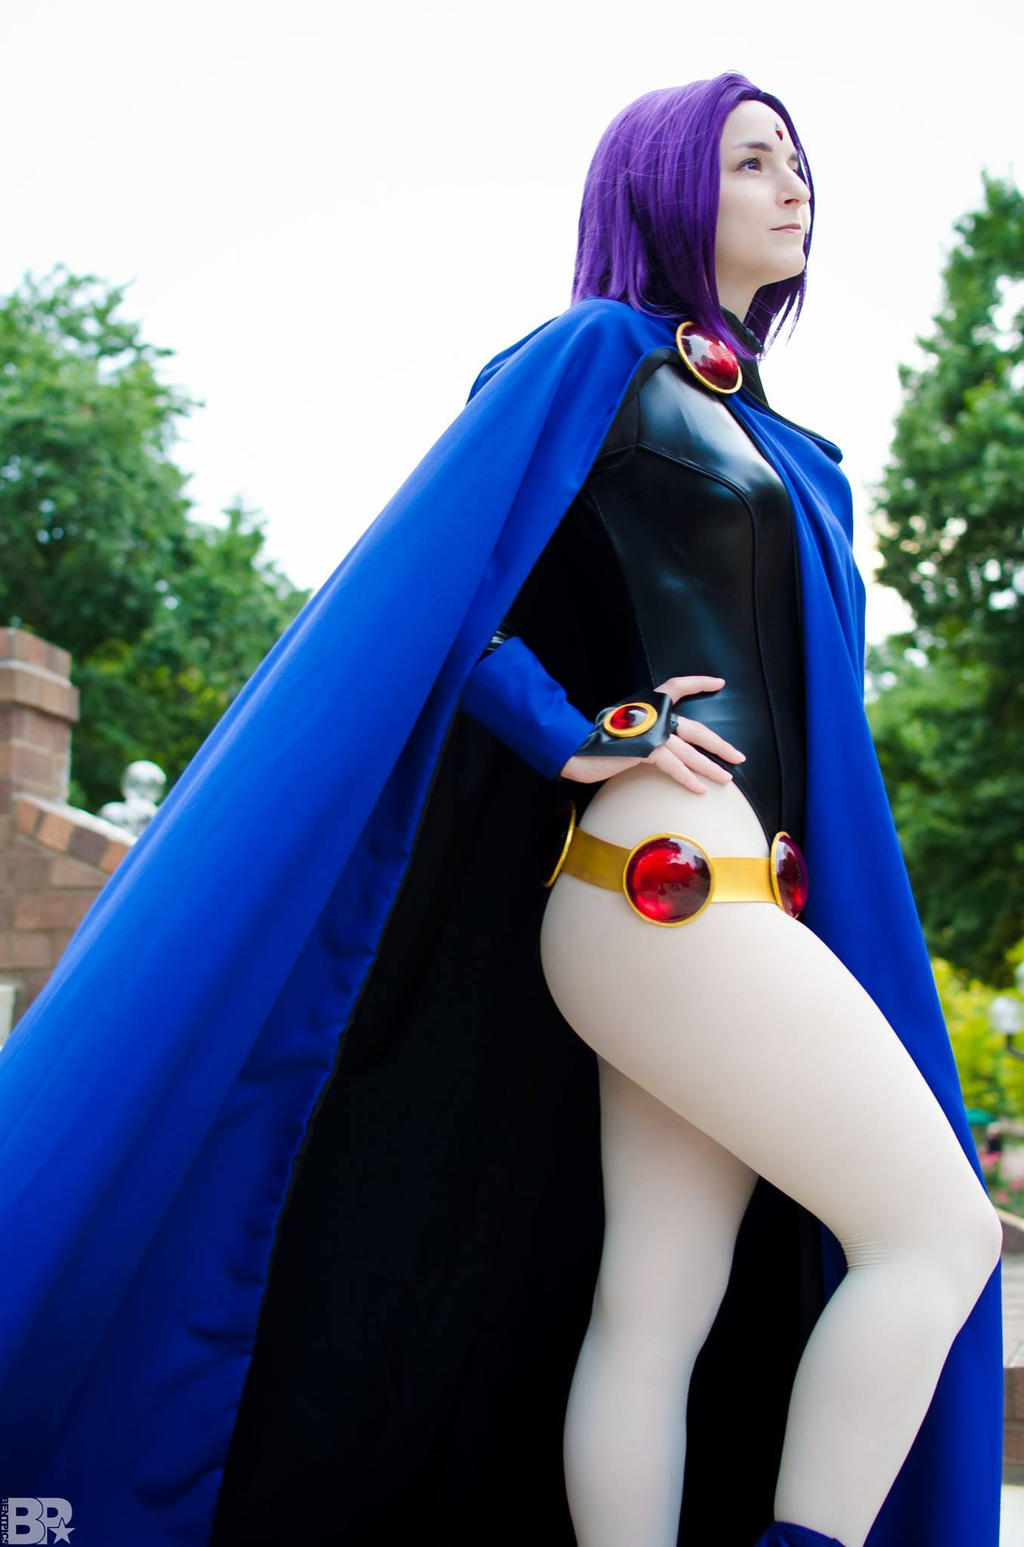 Teen titans go cosplay